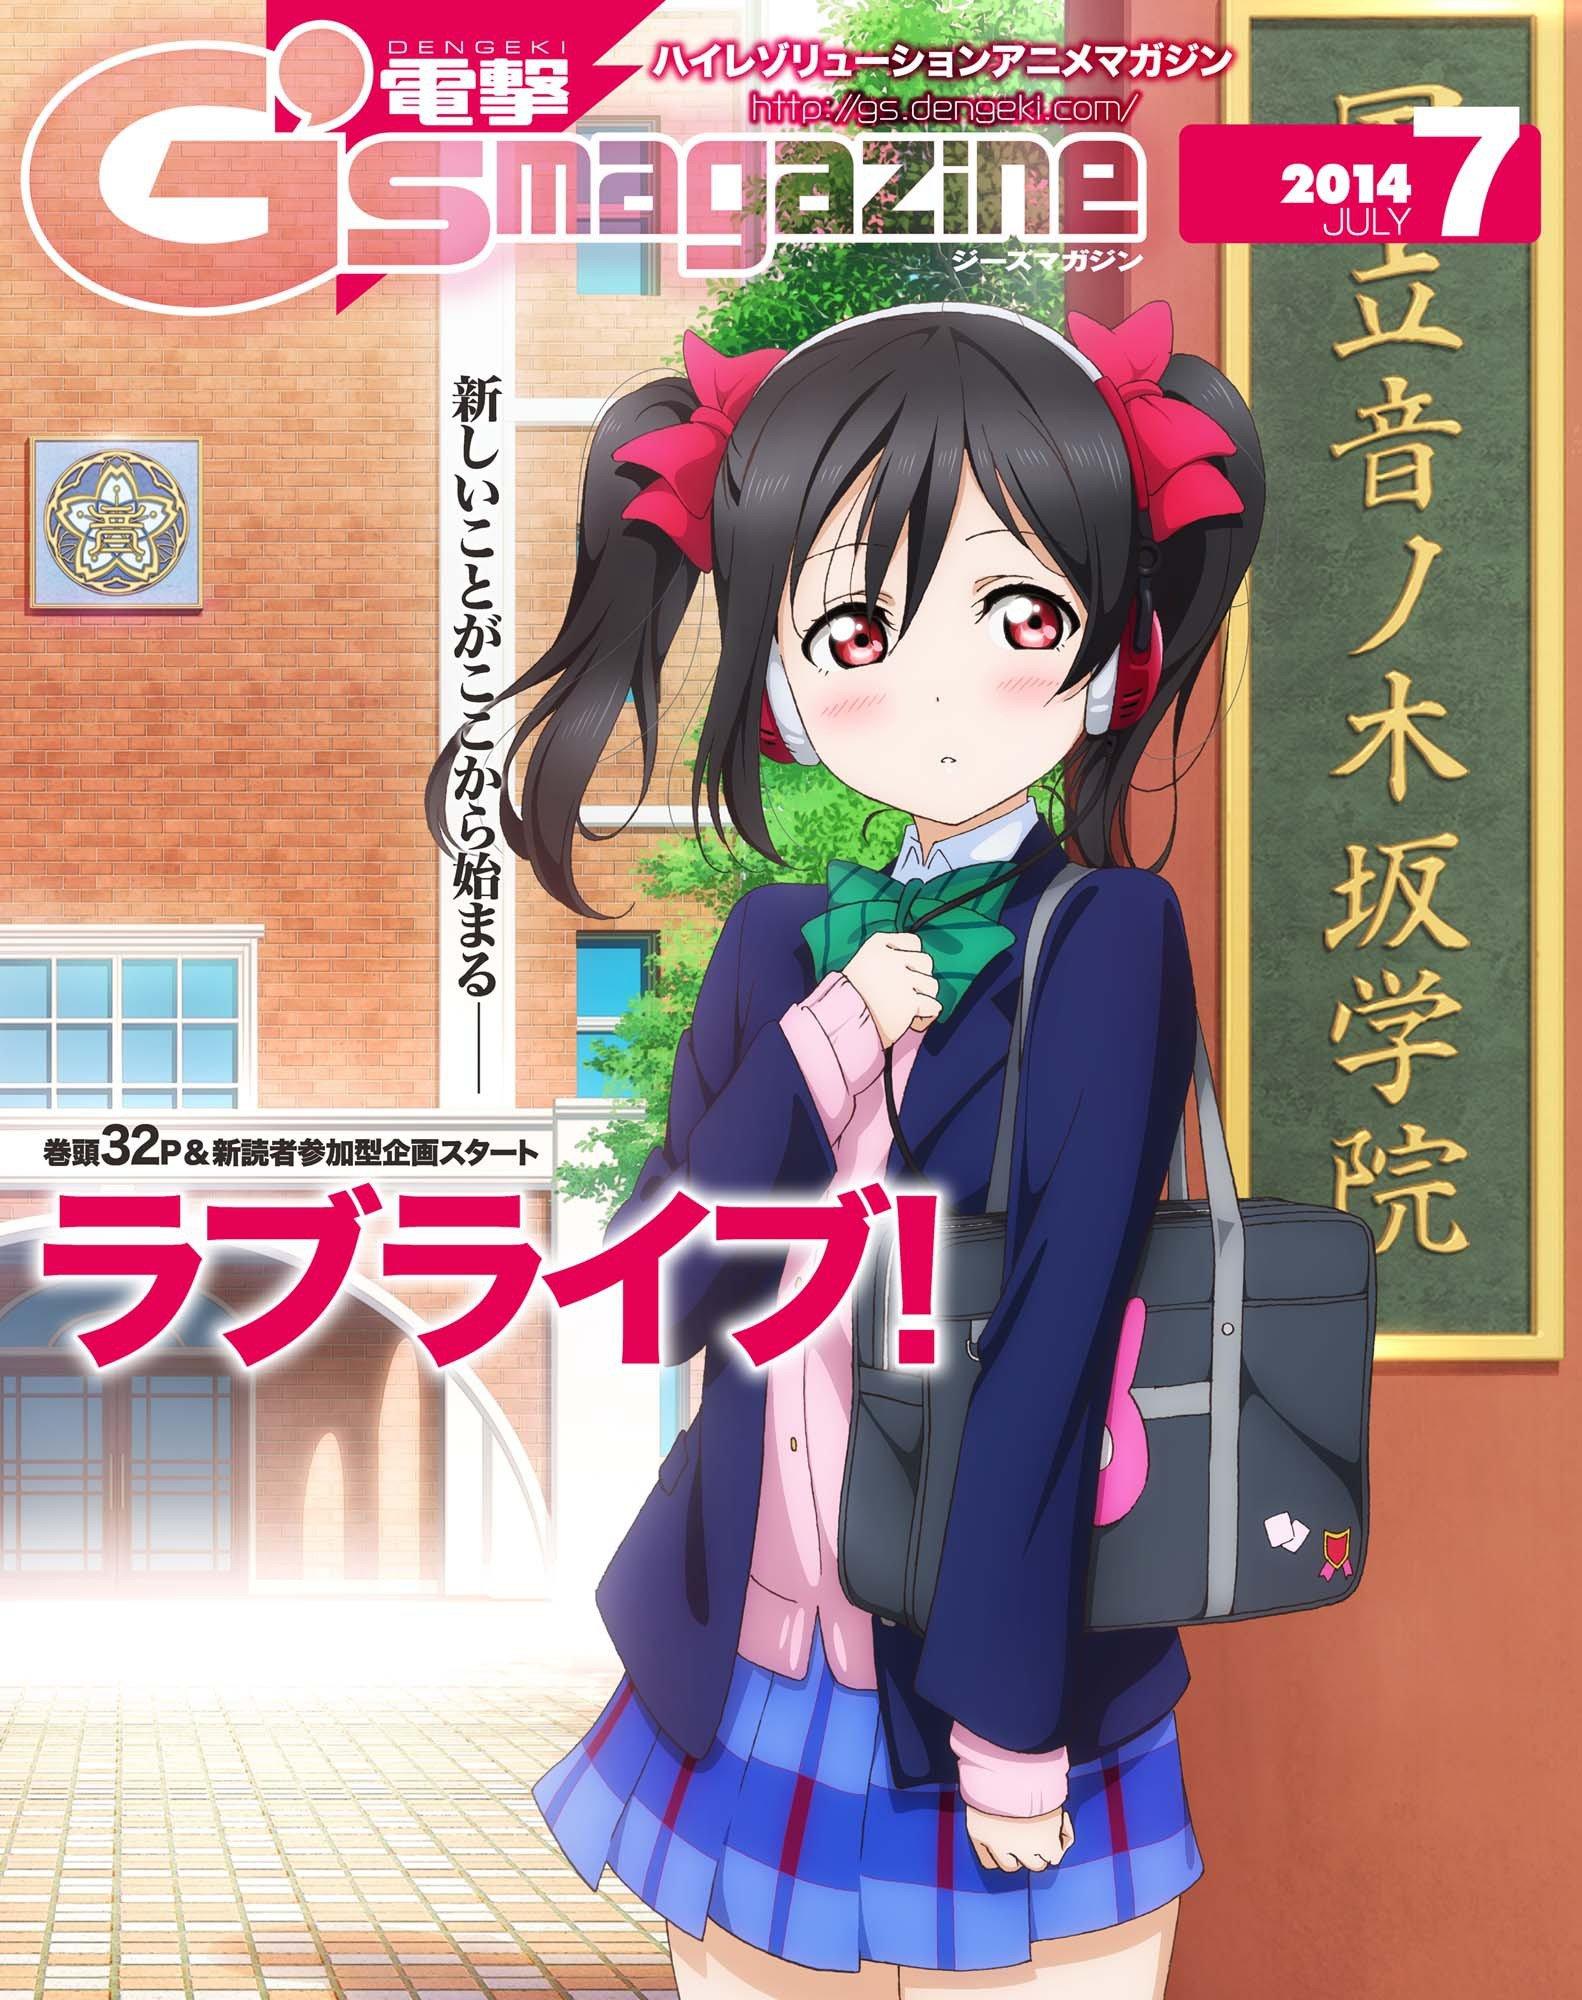 Dengeki G's Magazine Issue 204 (July 2014) (digital edition)